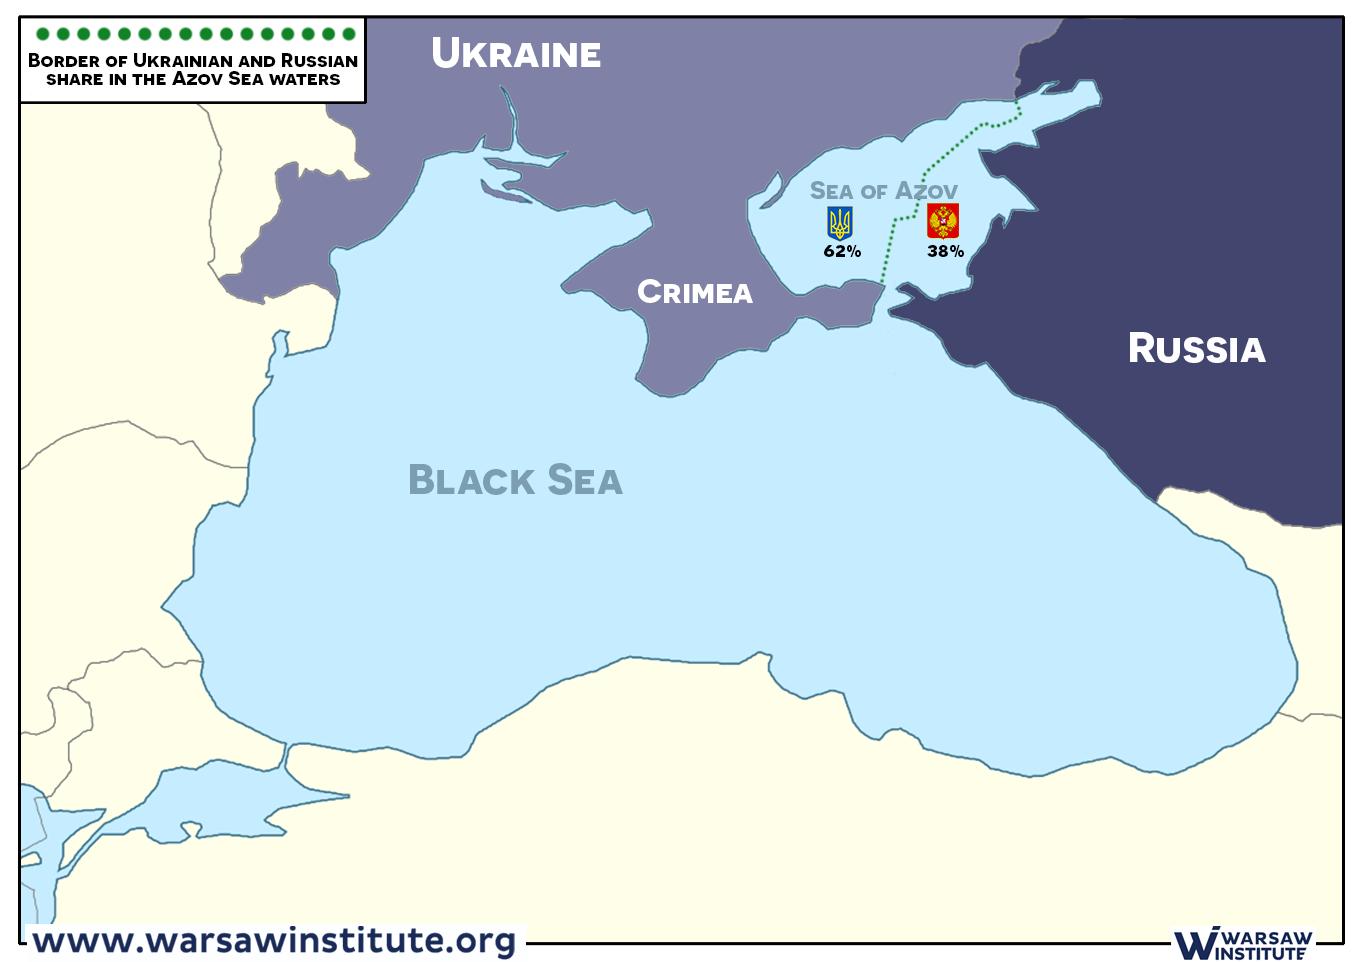 Russia's Strategic Considerations on the Sea of Azov